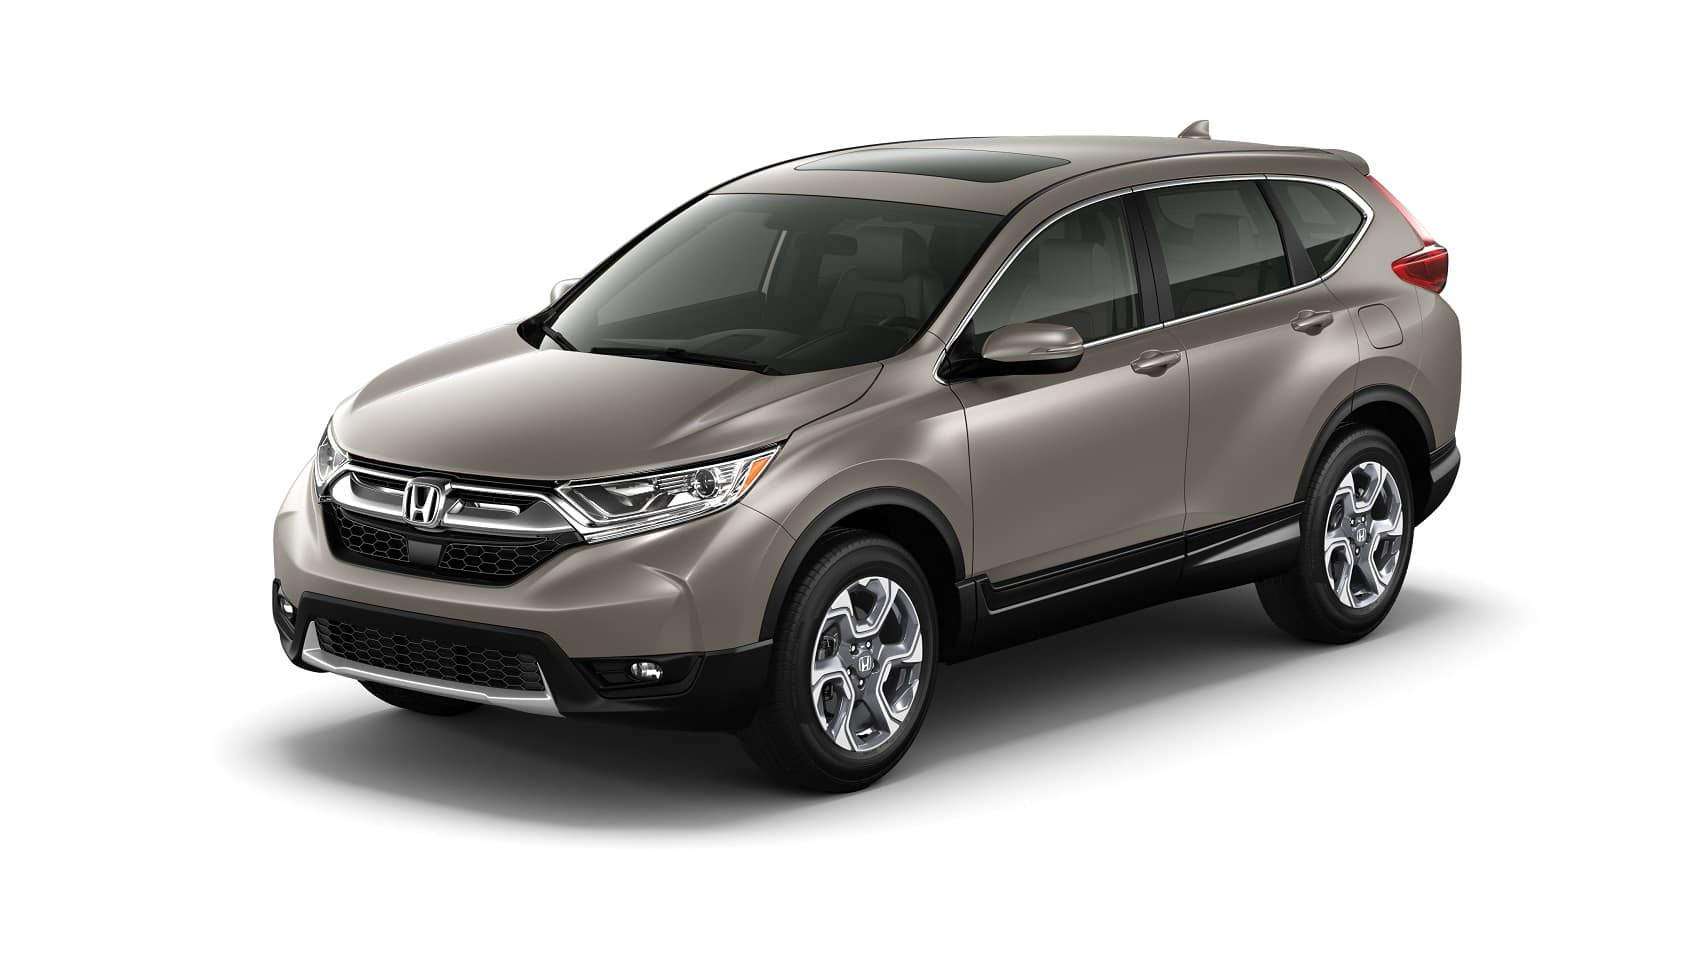 Honda SUV near Abington PA